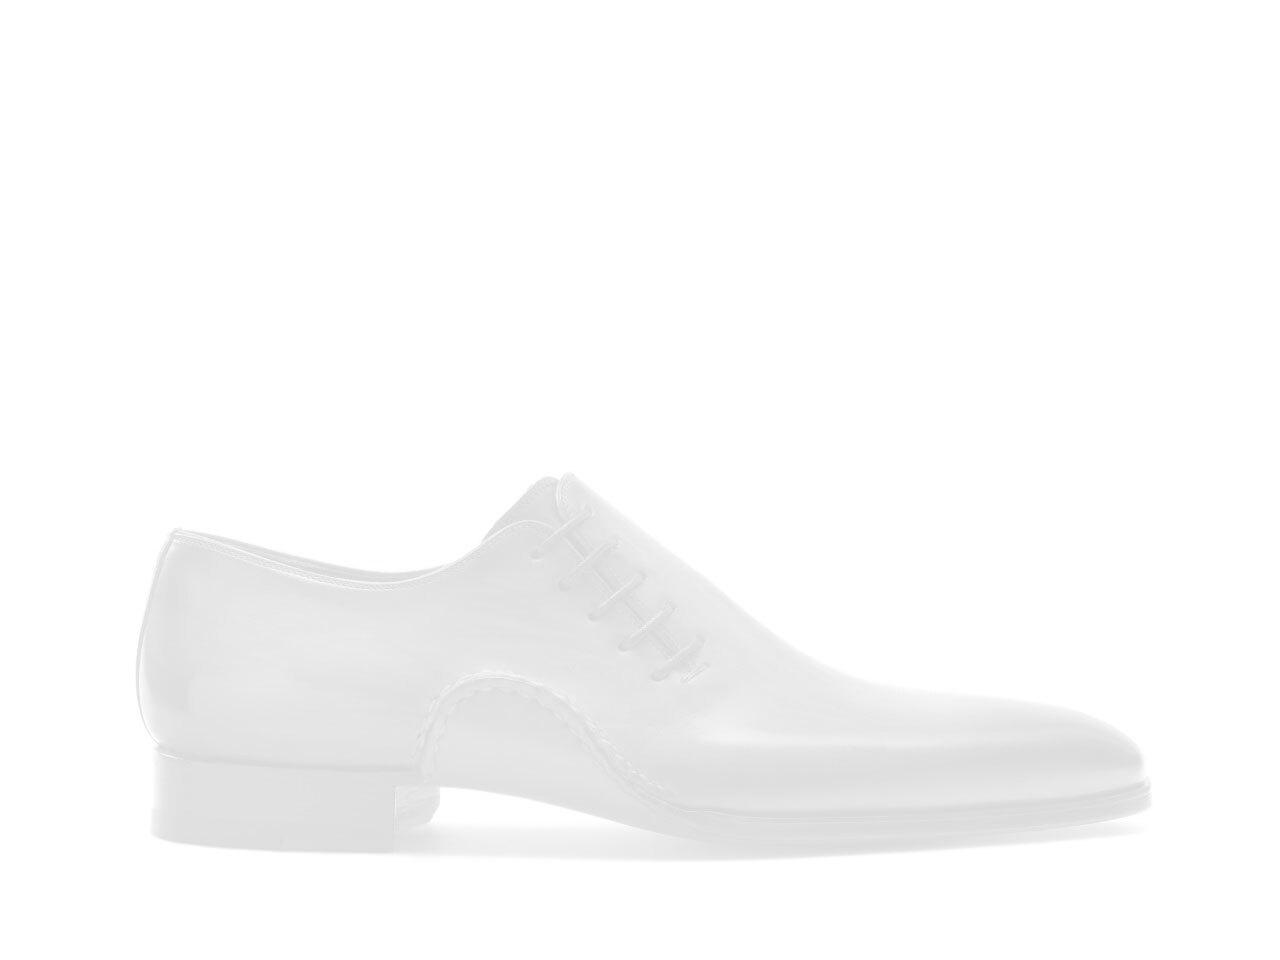 Side view of the Magnanni Basilio Lo Cuero Men's Sneakers